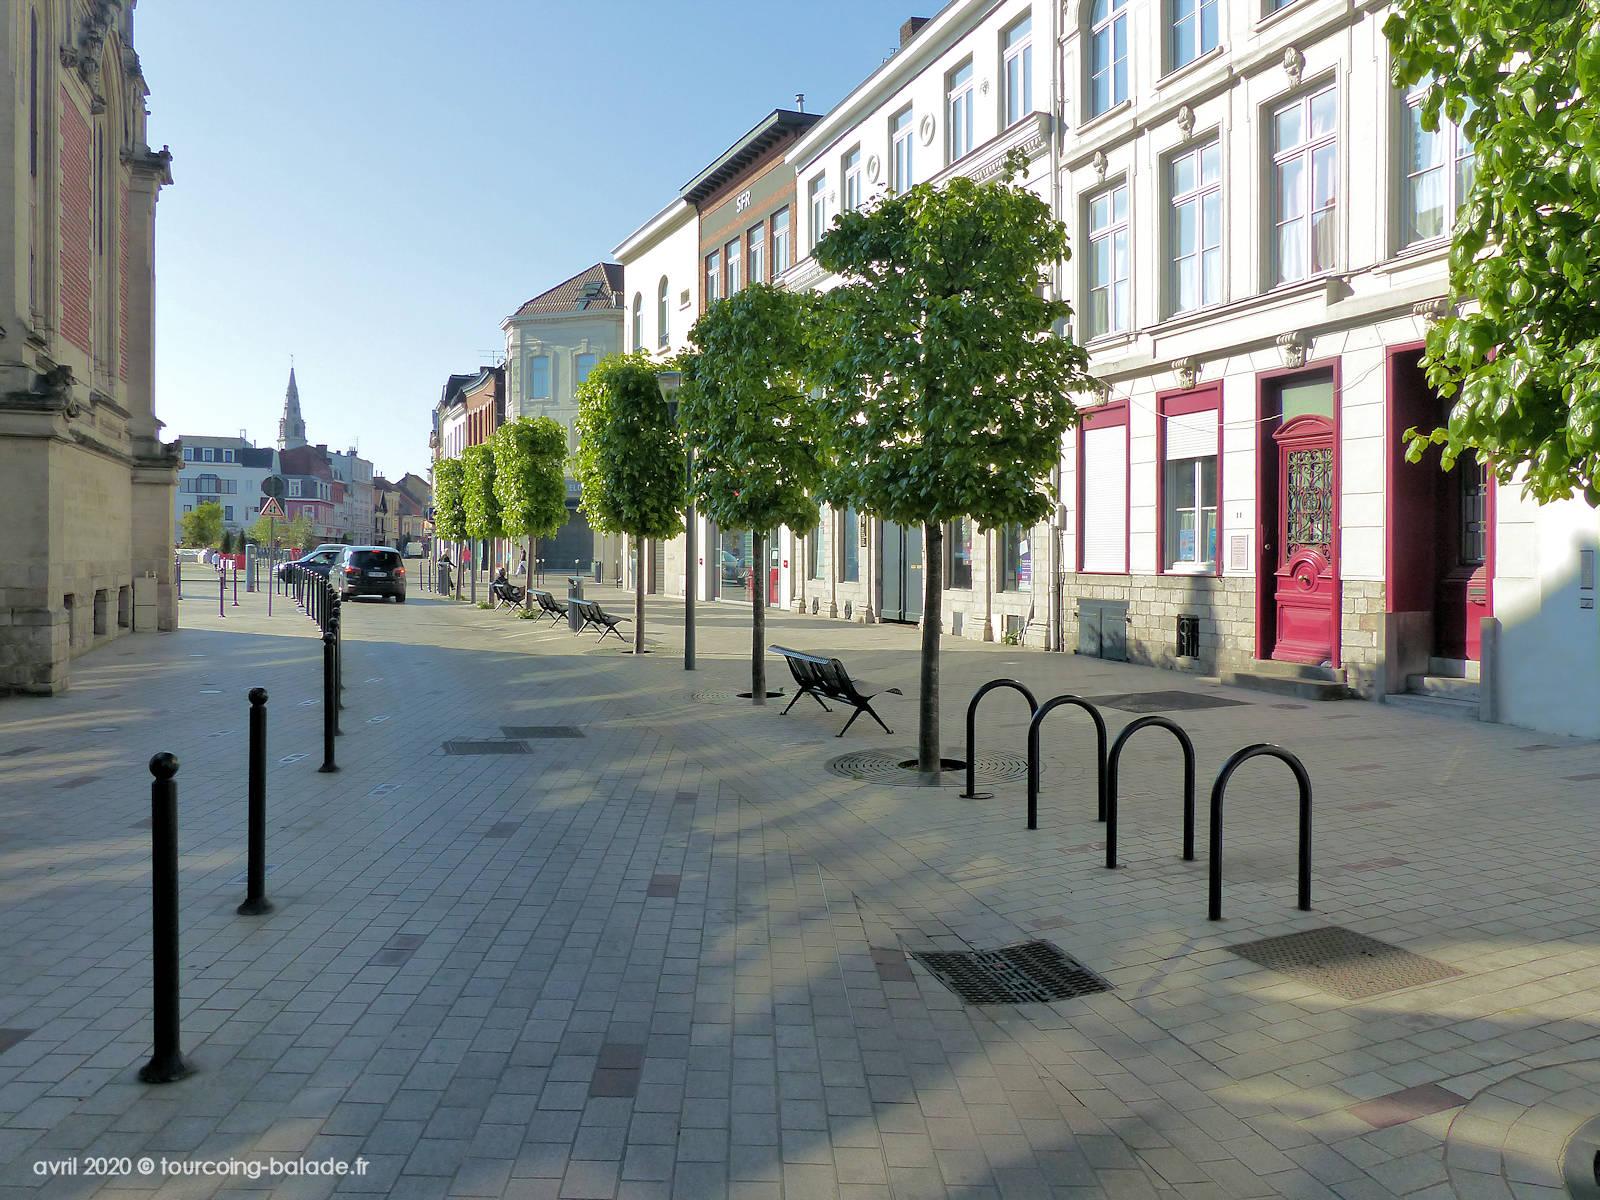 Rue de Tournai, Tourcoing, 2020